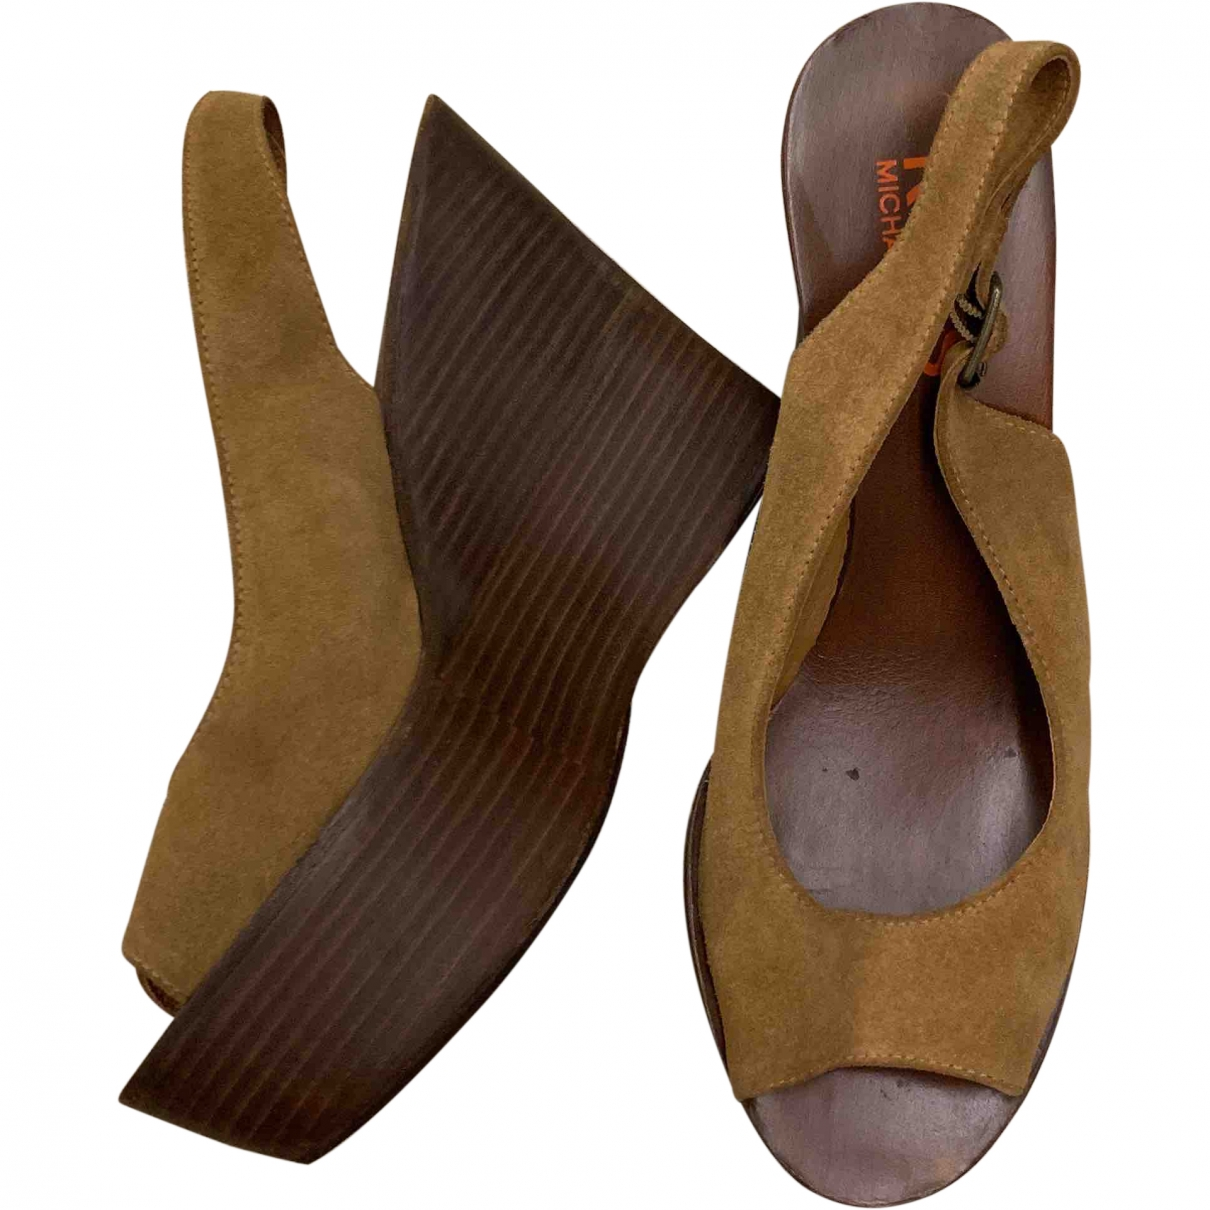 Michael Kors \N Brown Suede Sandals for Women 38.5 EU